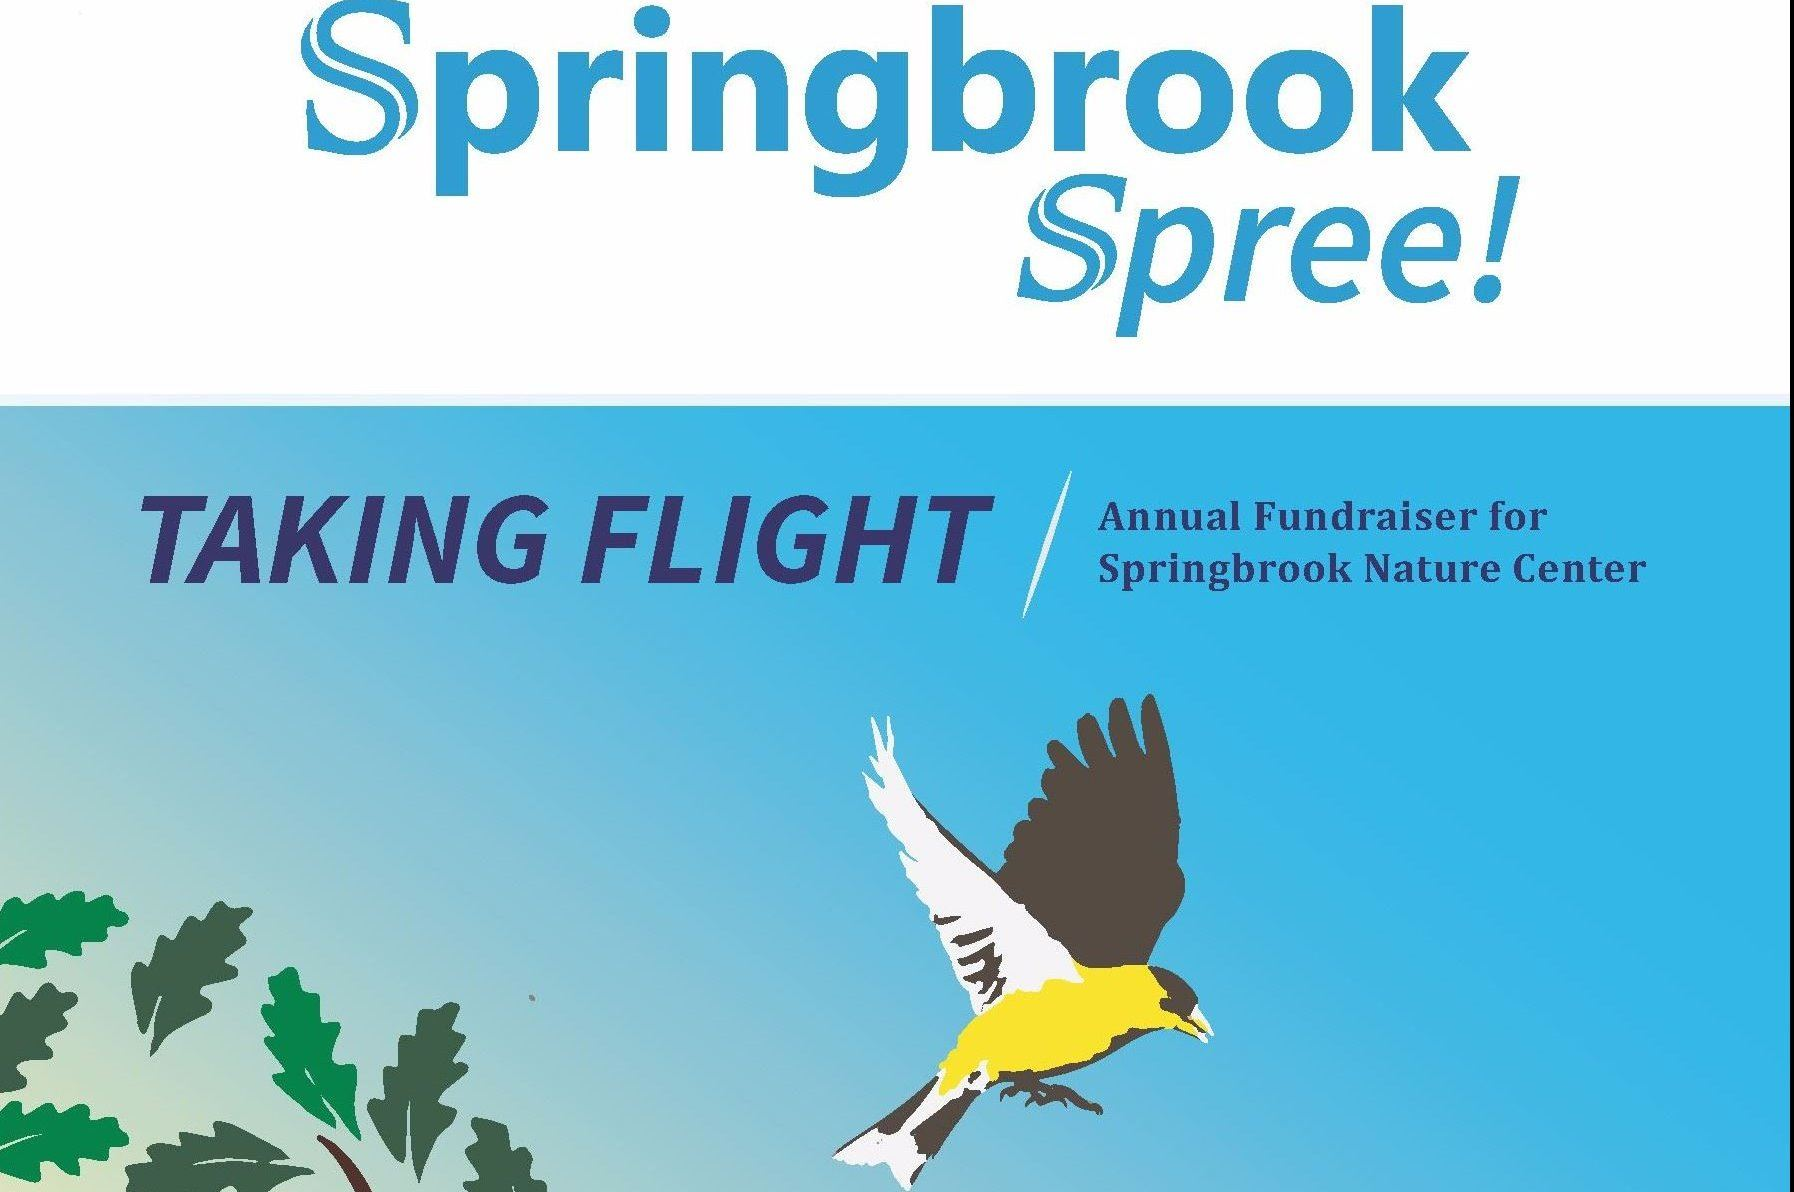 Springbrook Nature Center | Fridley, MN - Official Website